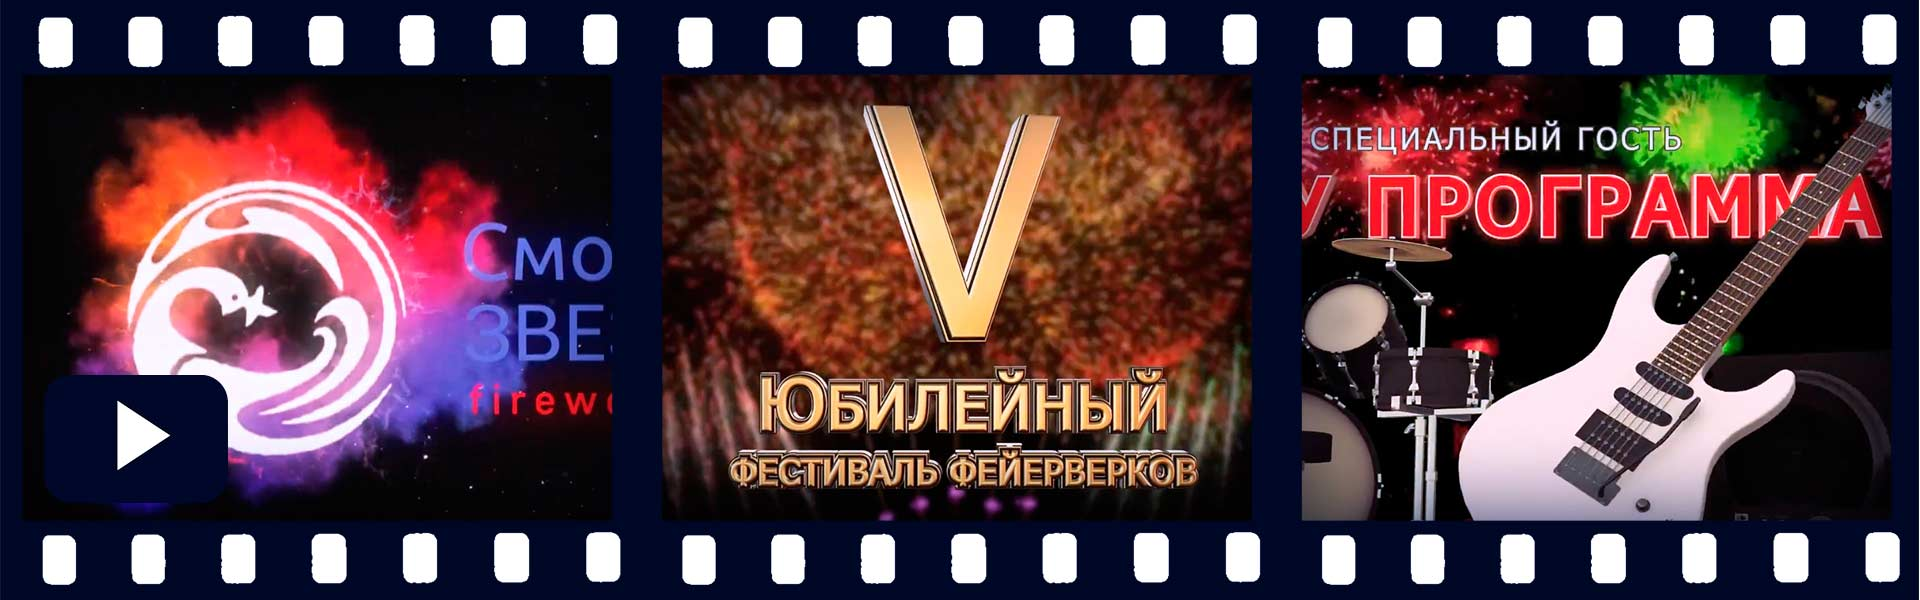 "Телереклама для фестиваля ""Смоленский звездопад"""